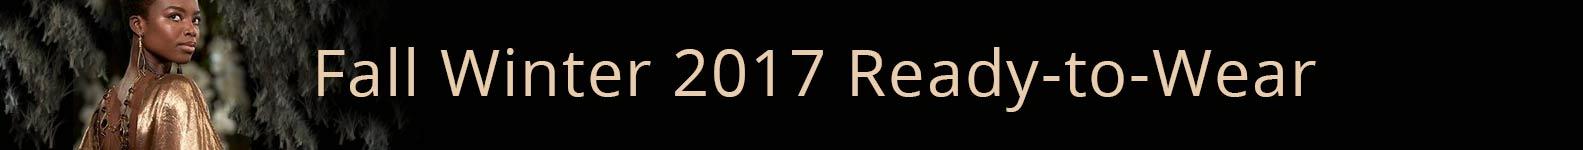 fall-winter-2017-fashion-shows-fw17-2017